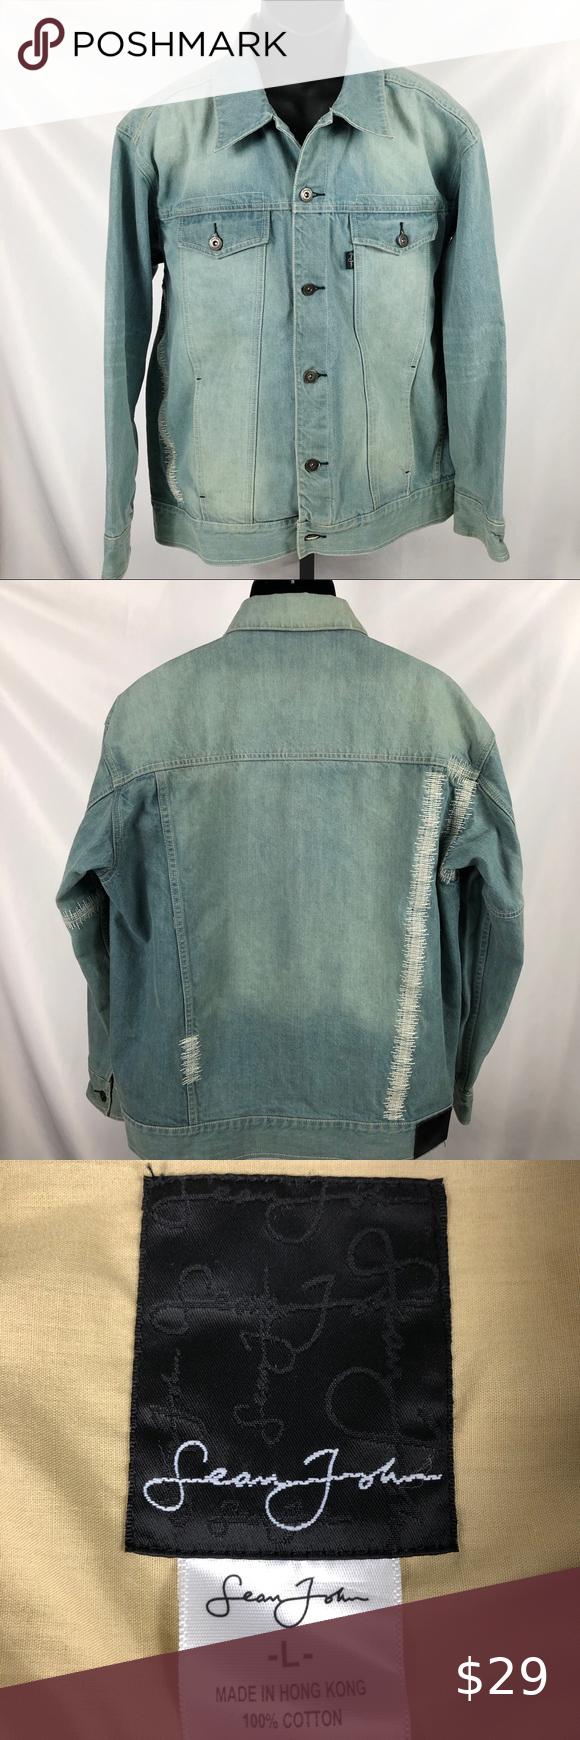 Sean John Jean Jacket Size L Sean John Jeans Jackets Jean Jacket [ 1740 x 580 Pixel ]